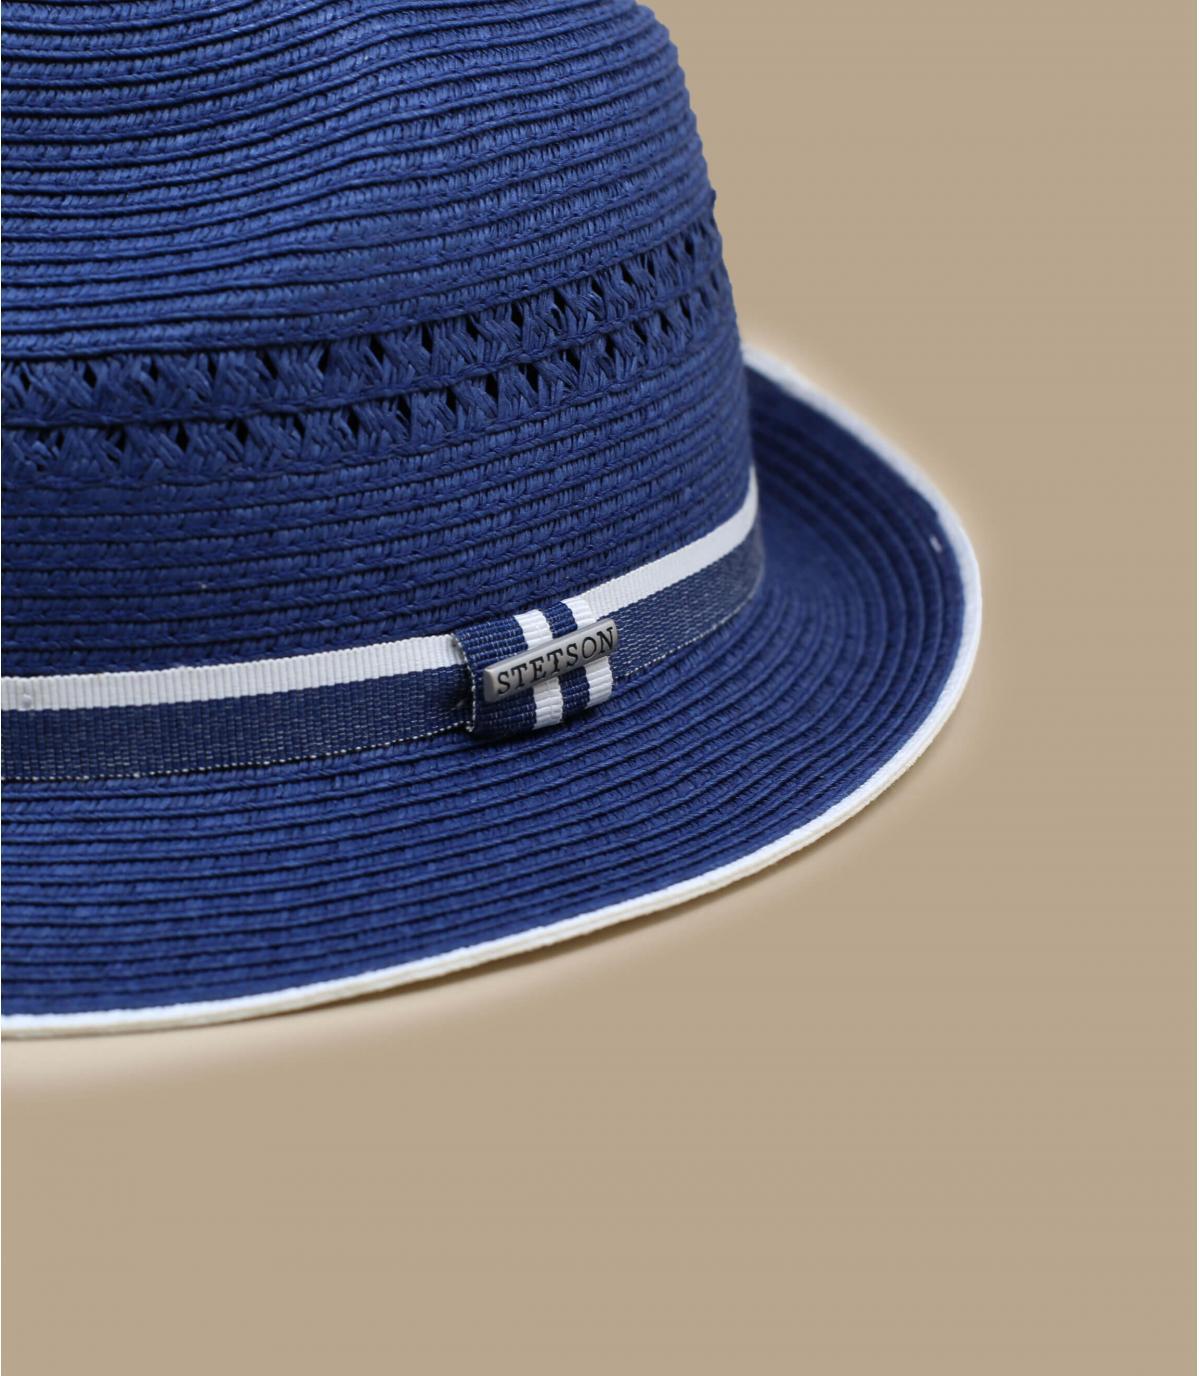 Detalles Trilby Toyo blue imagen 3